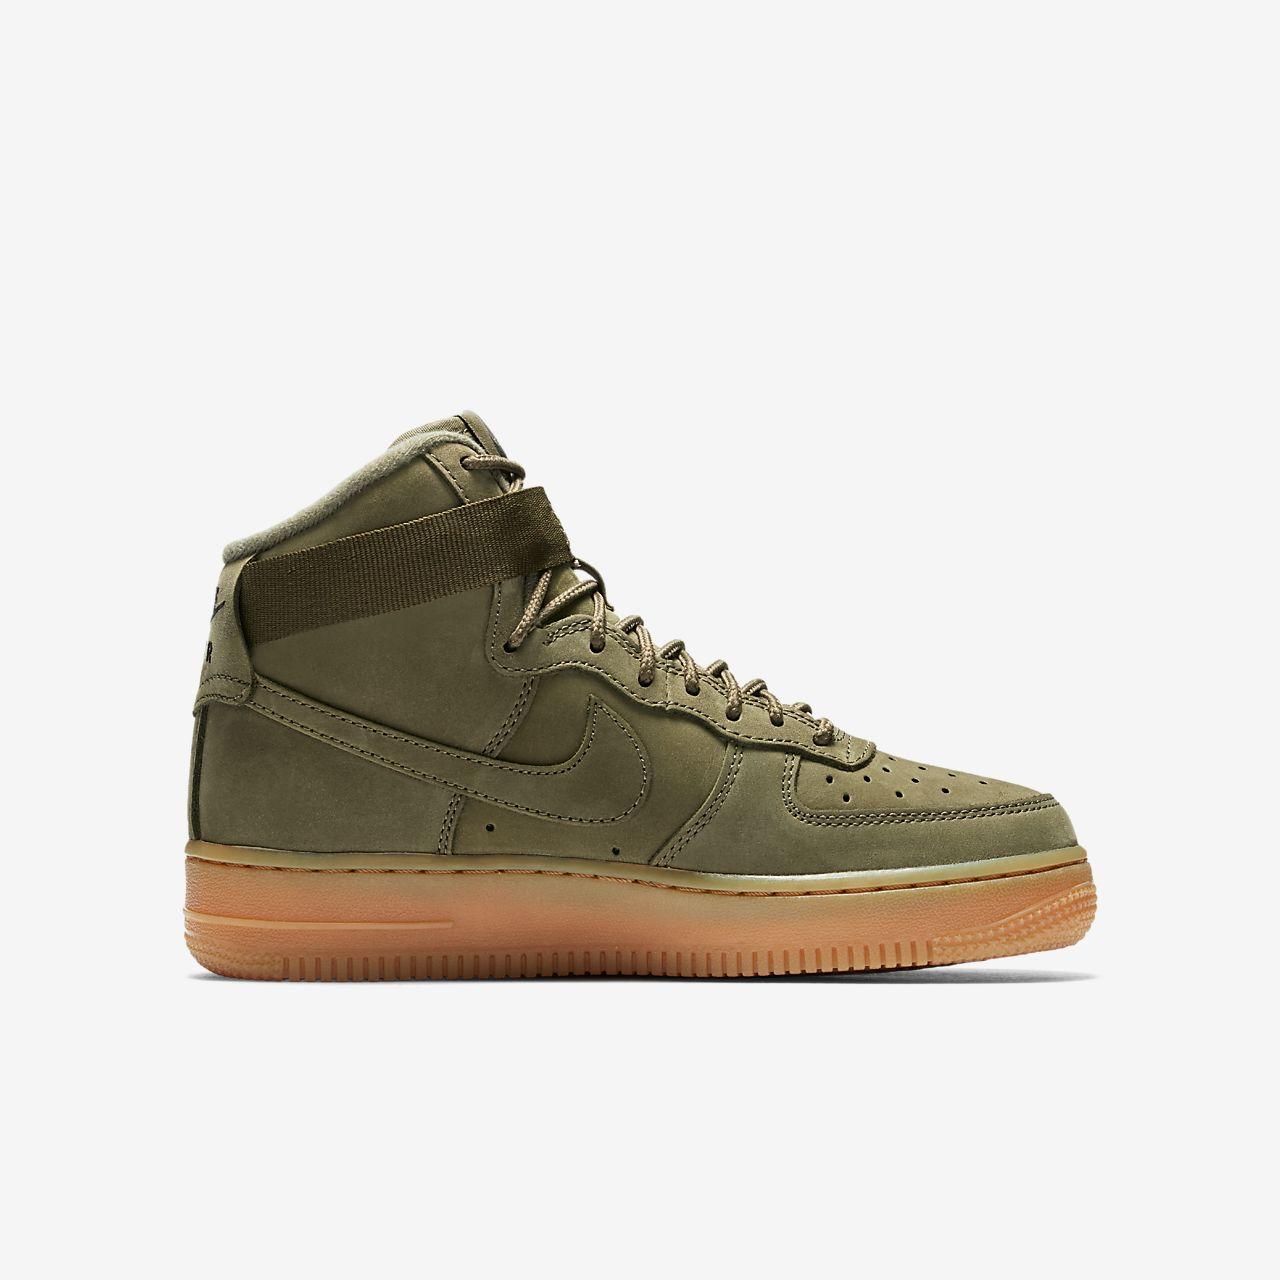 ... Nike Air Force 1 High WB Older Kids' Shoe